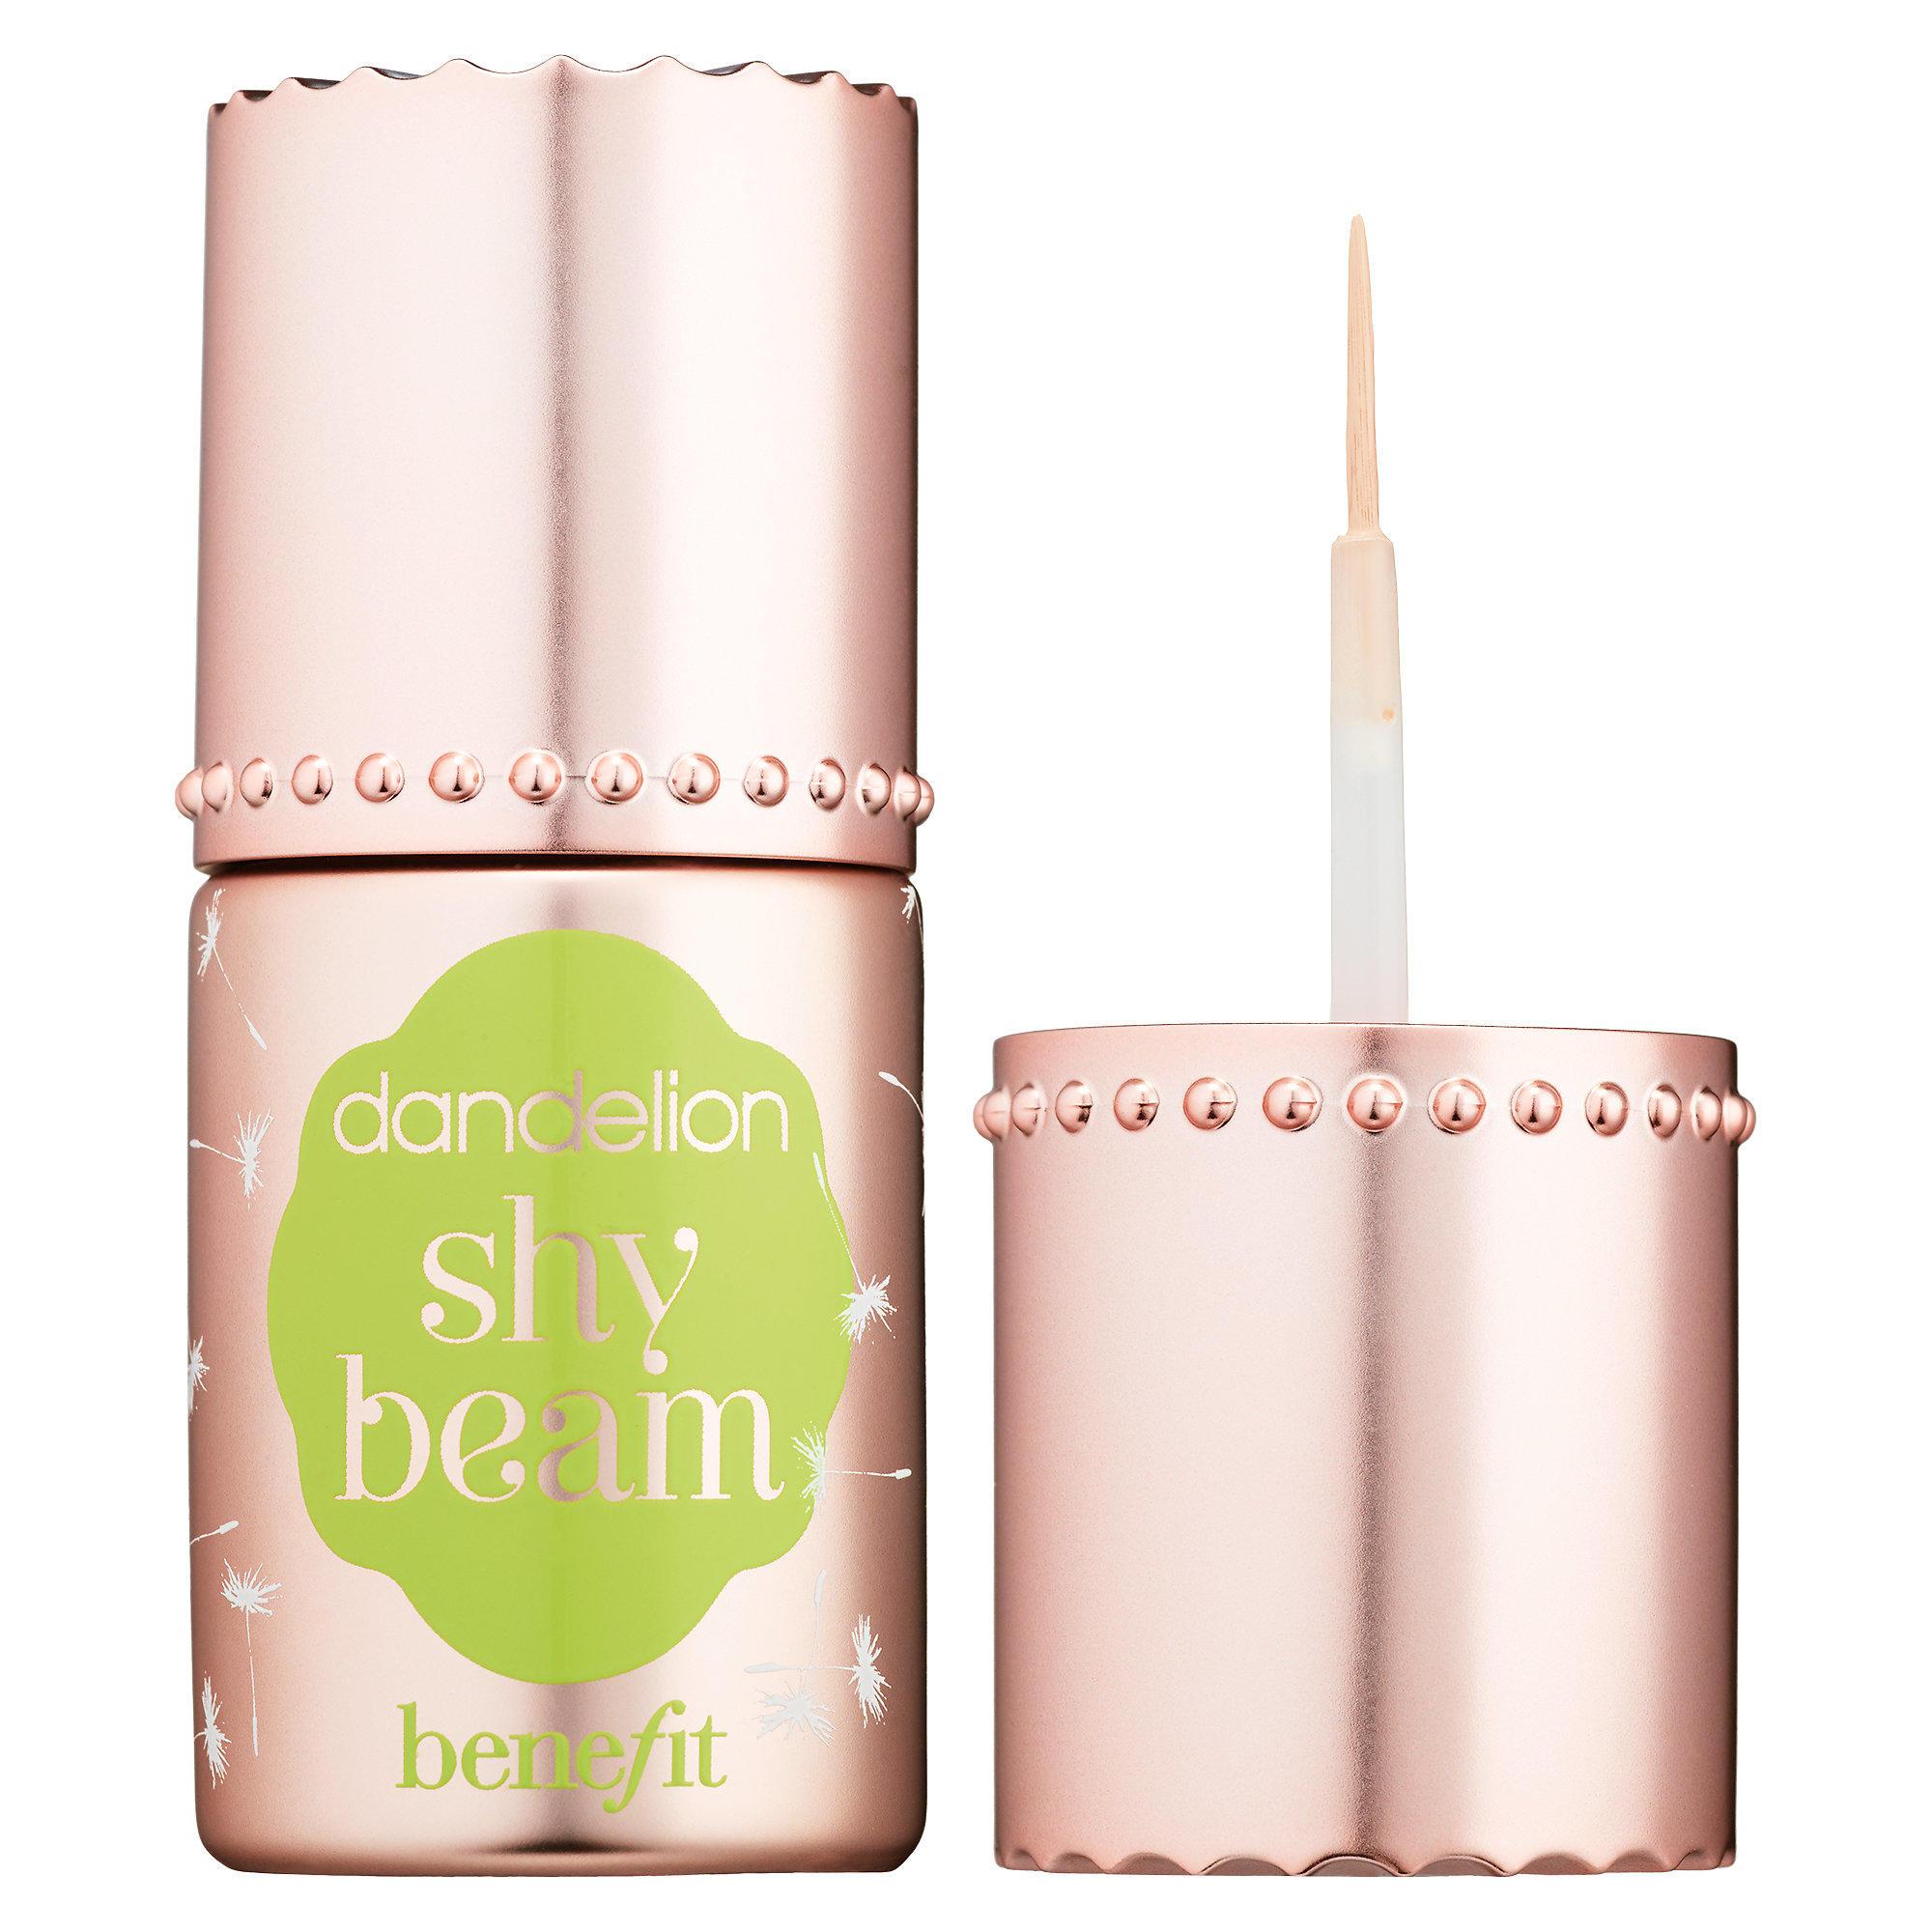 Benefit Dandelion Shy Beam Matte Highlighter